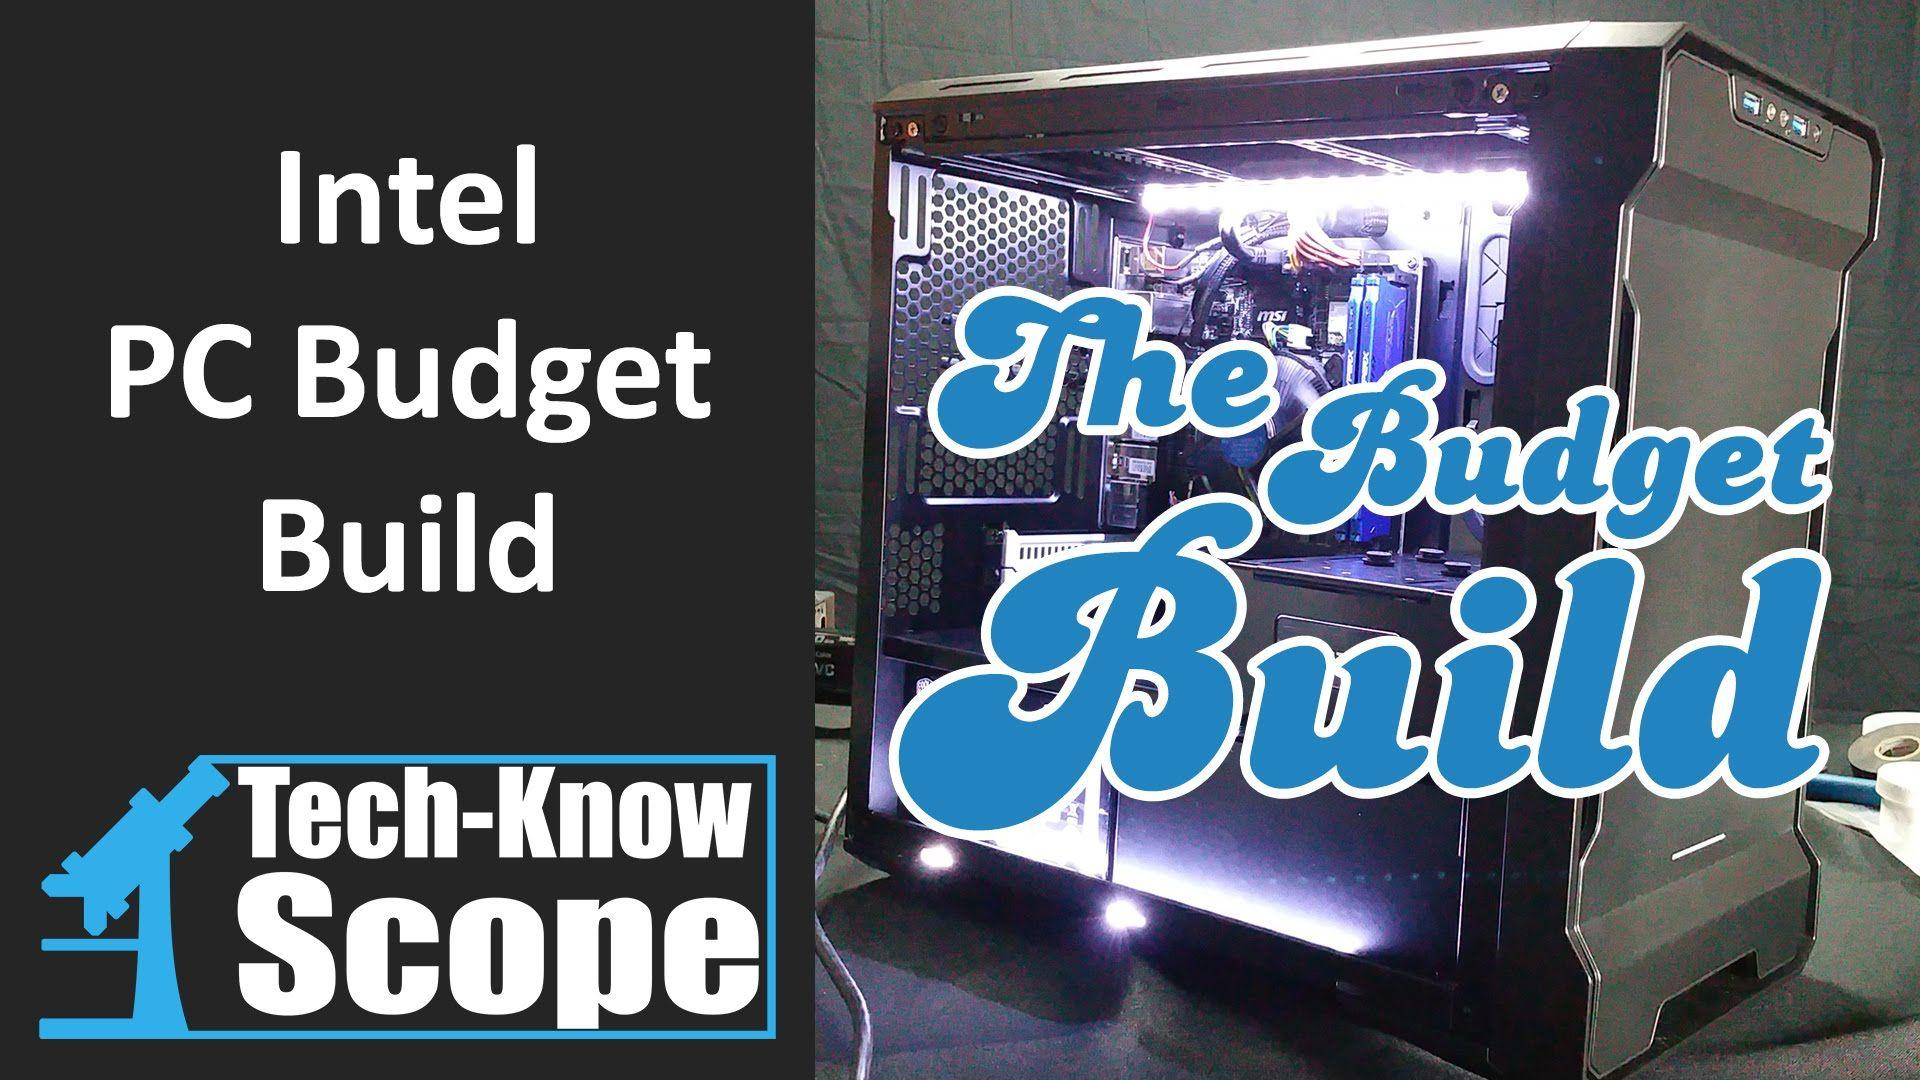 Intel PC Budget Build Budgeting, Intel, Build a pc